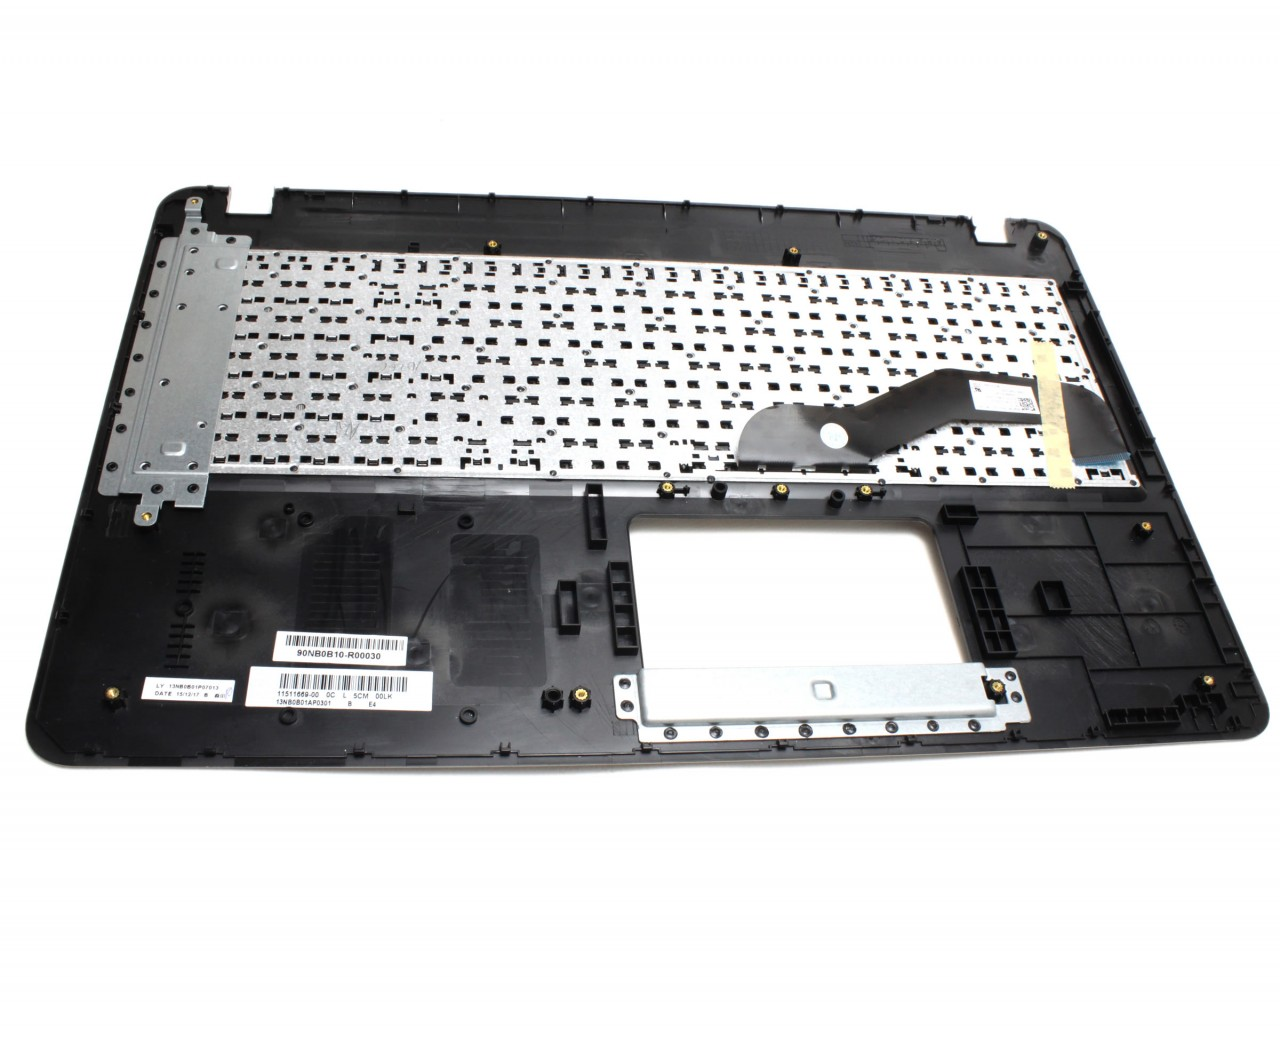 Tastatura Asus A540S neagra cu Palmrest auriu imagine powerlaptop.ro 2021